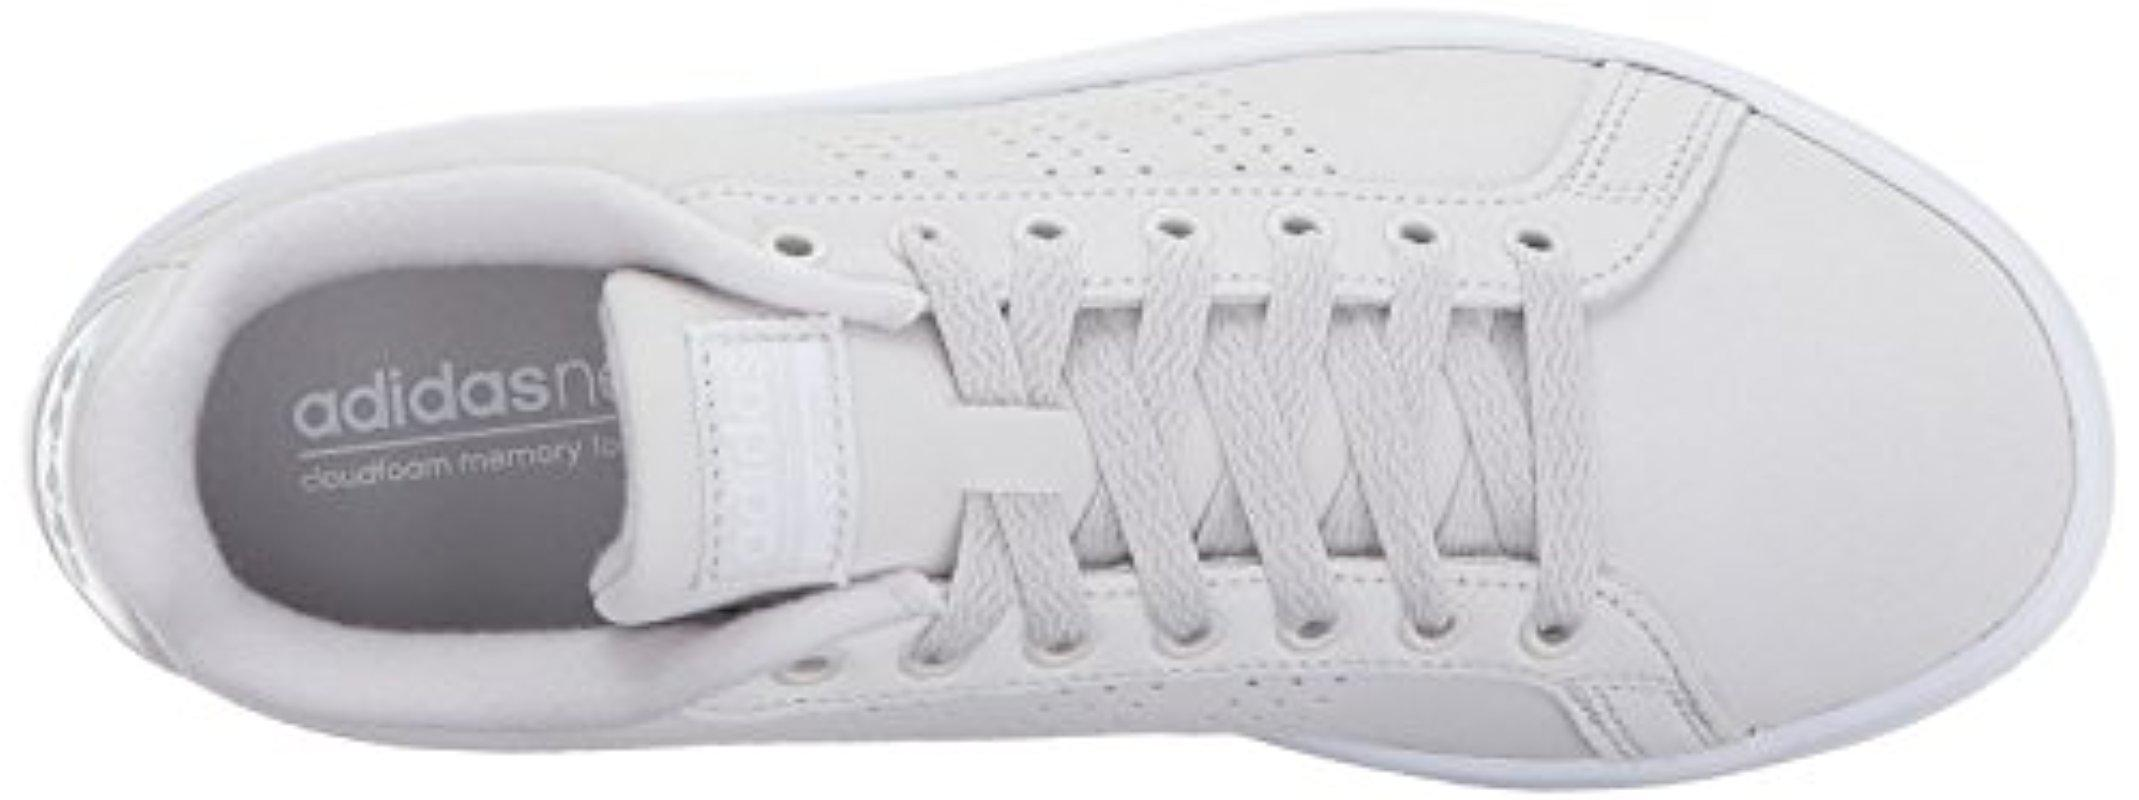 lyst adidas originali cloudfoam vantaggio pulito scarpe in grigio.